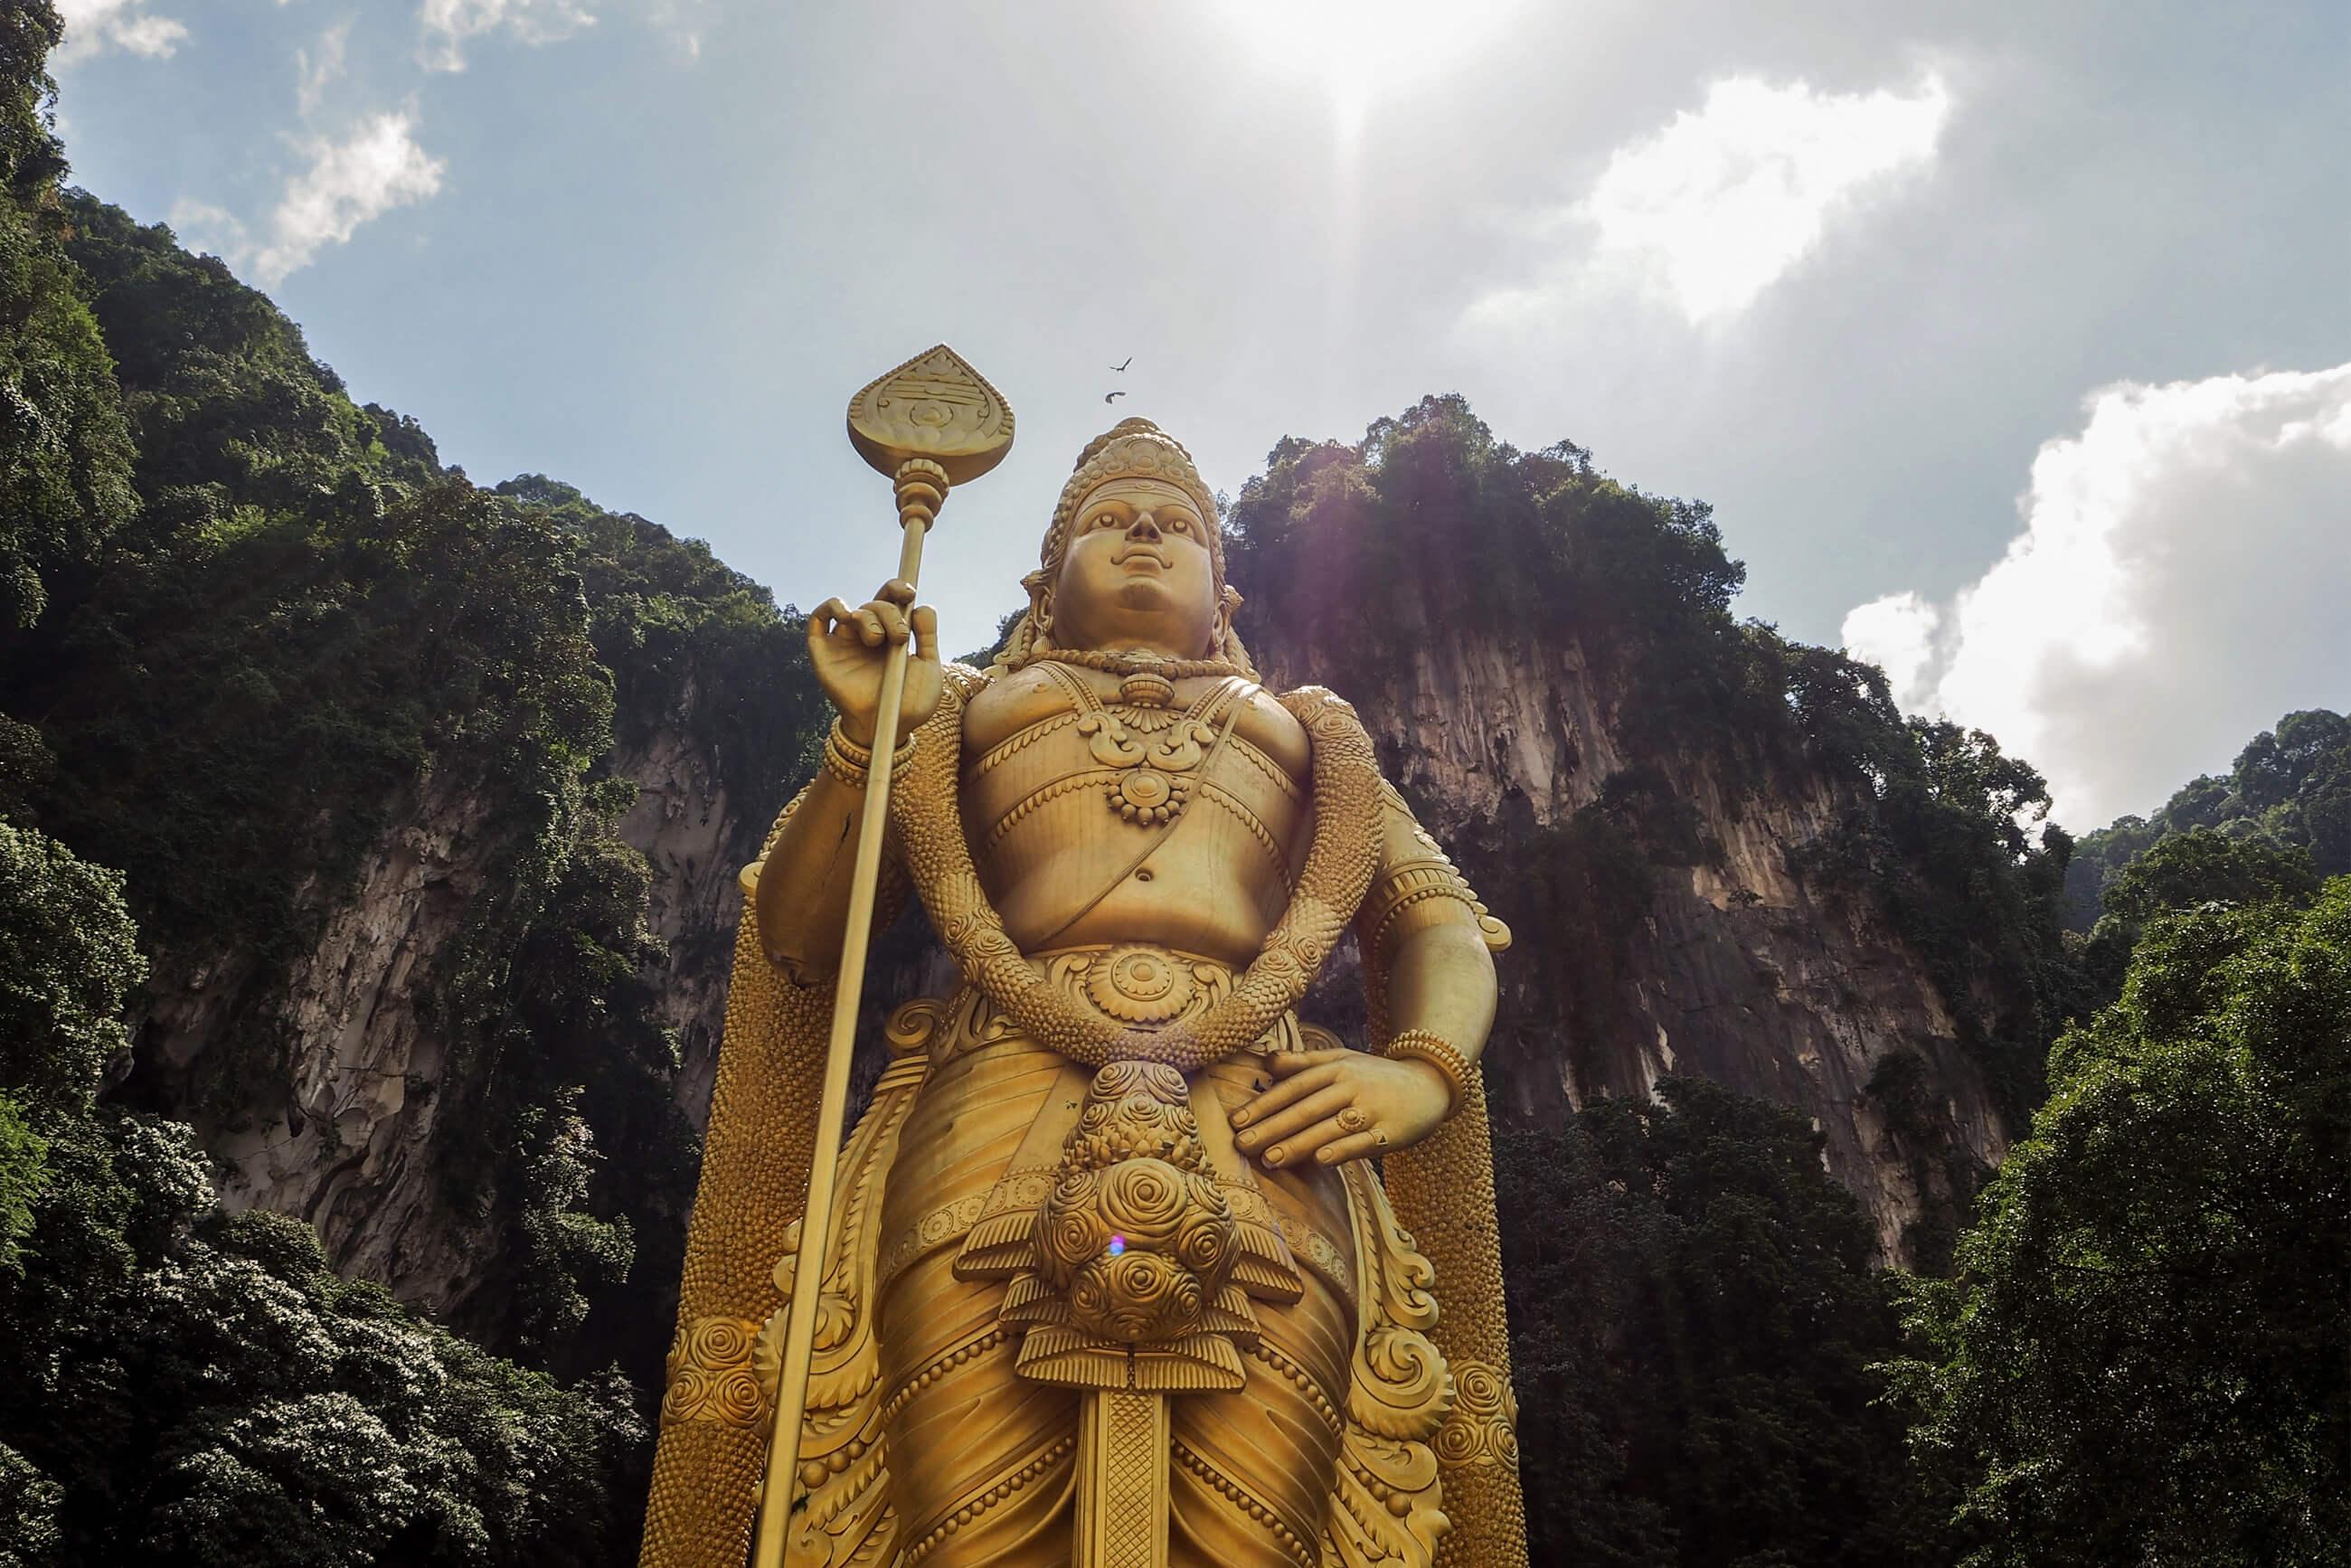 https://bubo.sk/uploads/galleries/5063/malajzia_kuala-lumpur-1920234.jpg